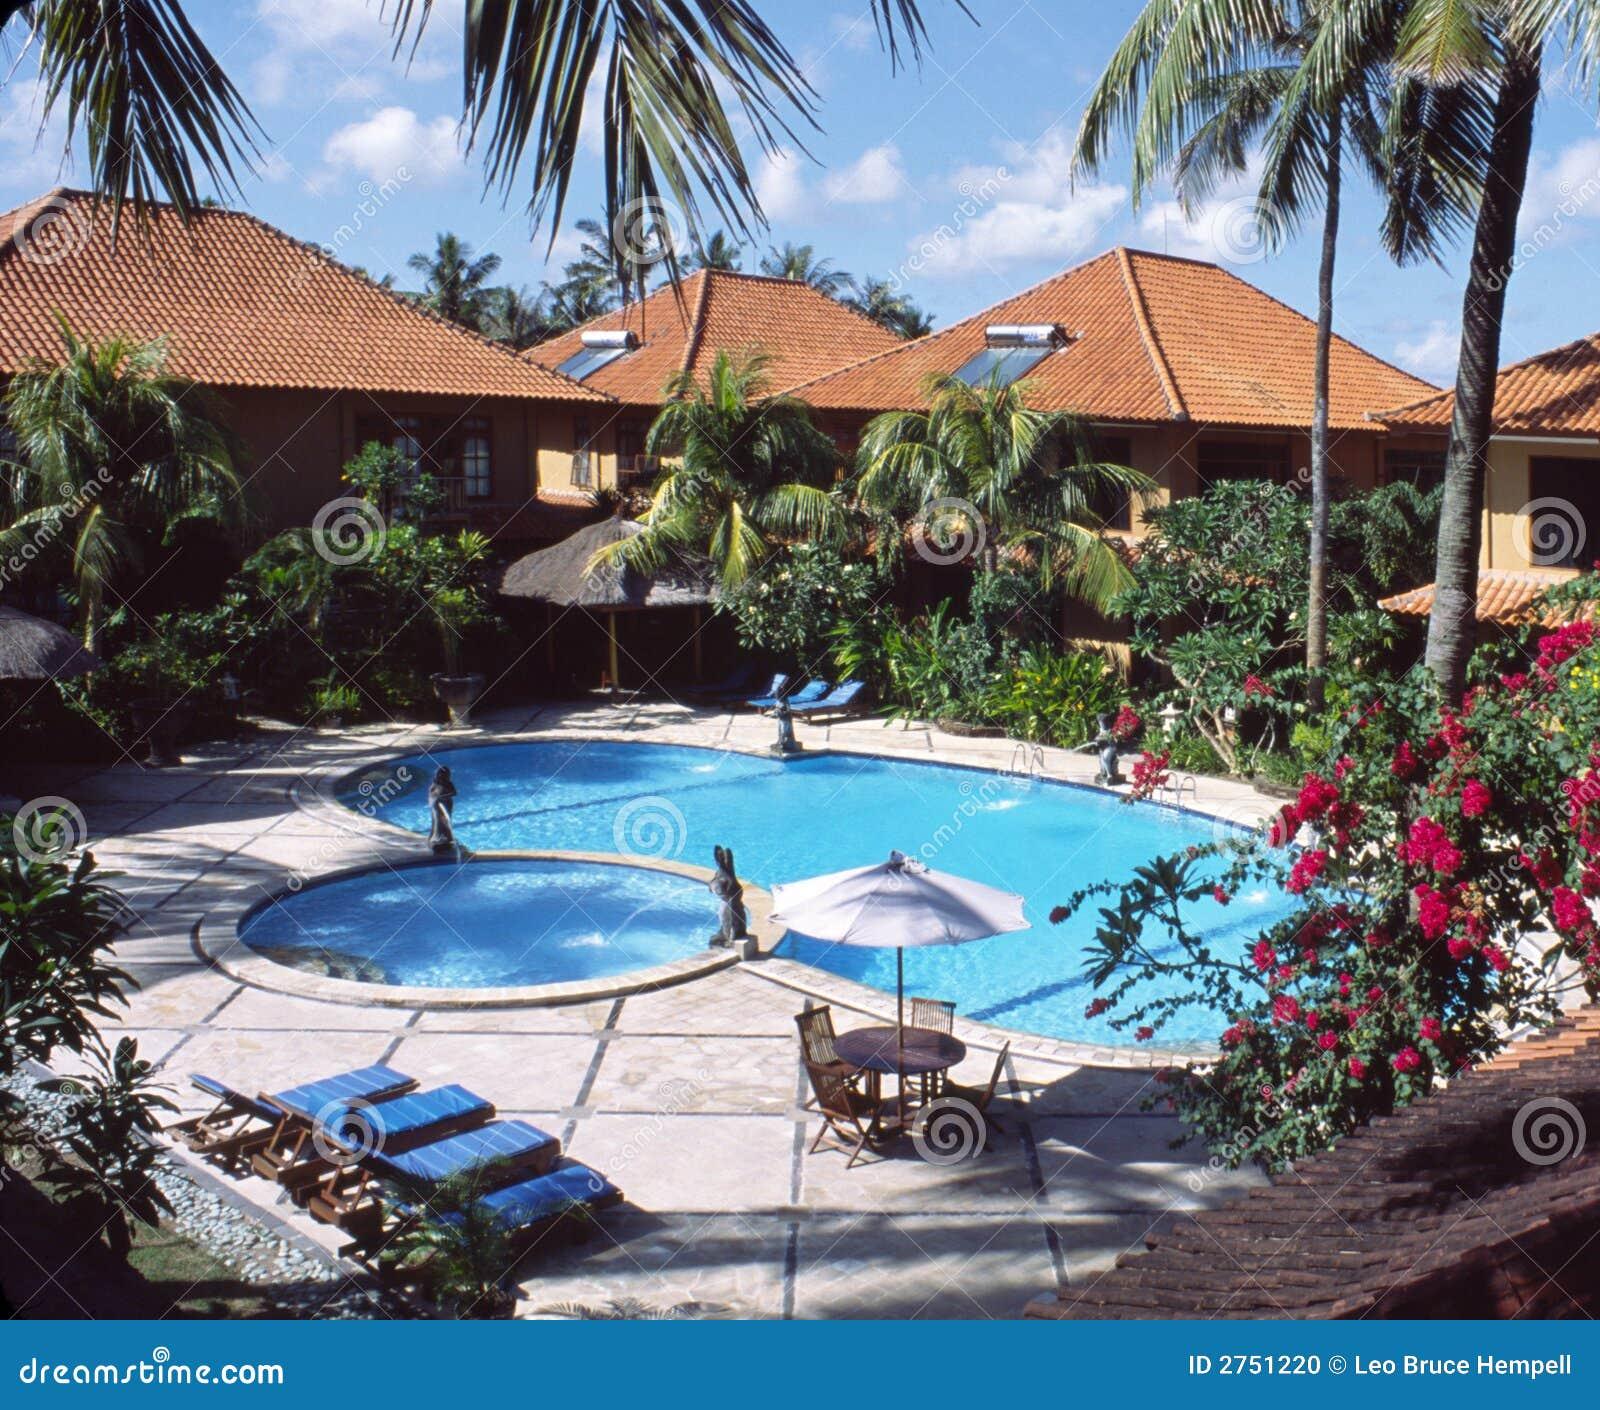 Bali Resort Indonesia